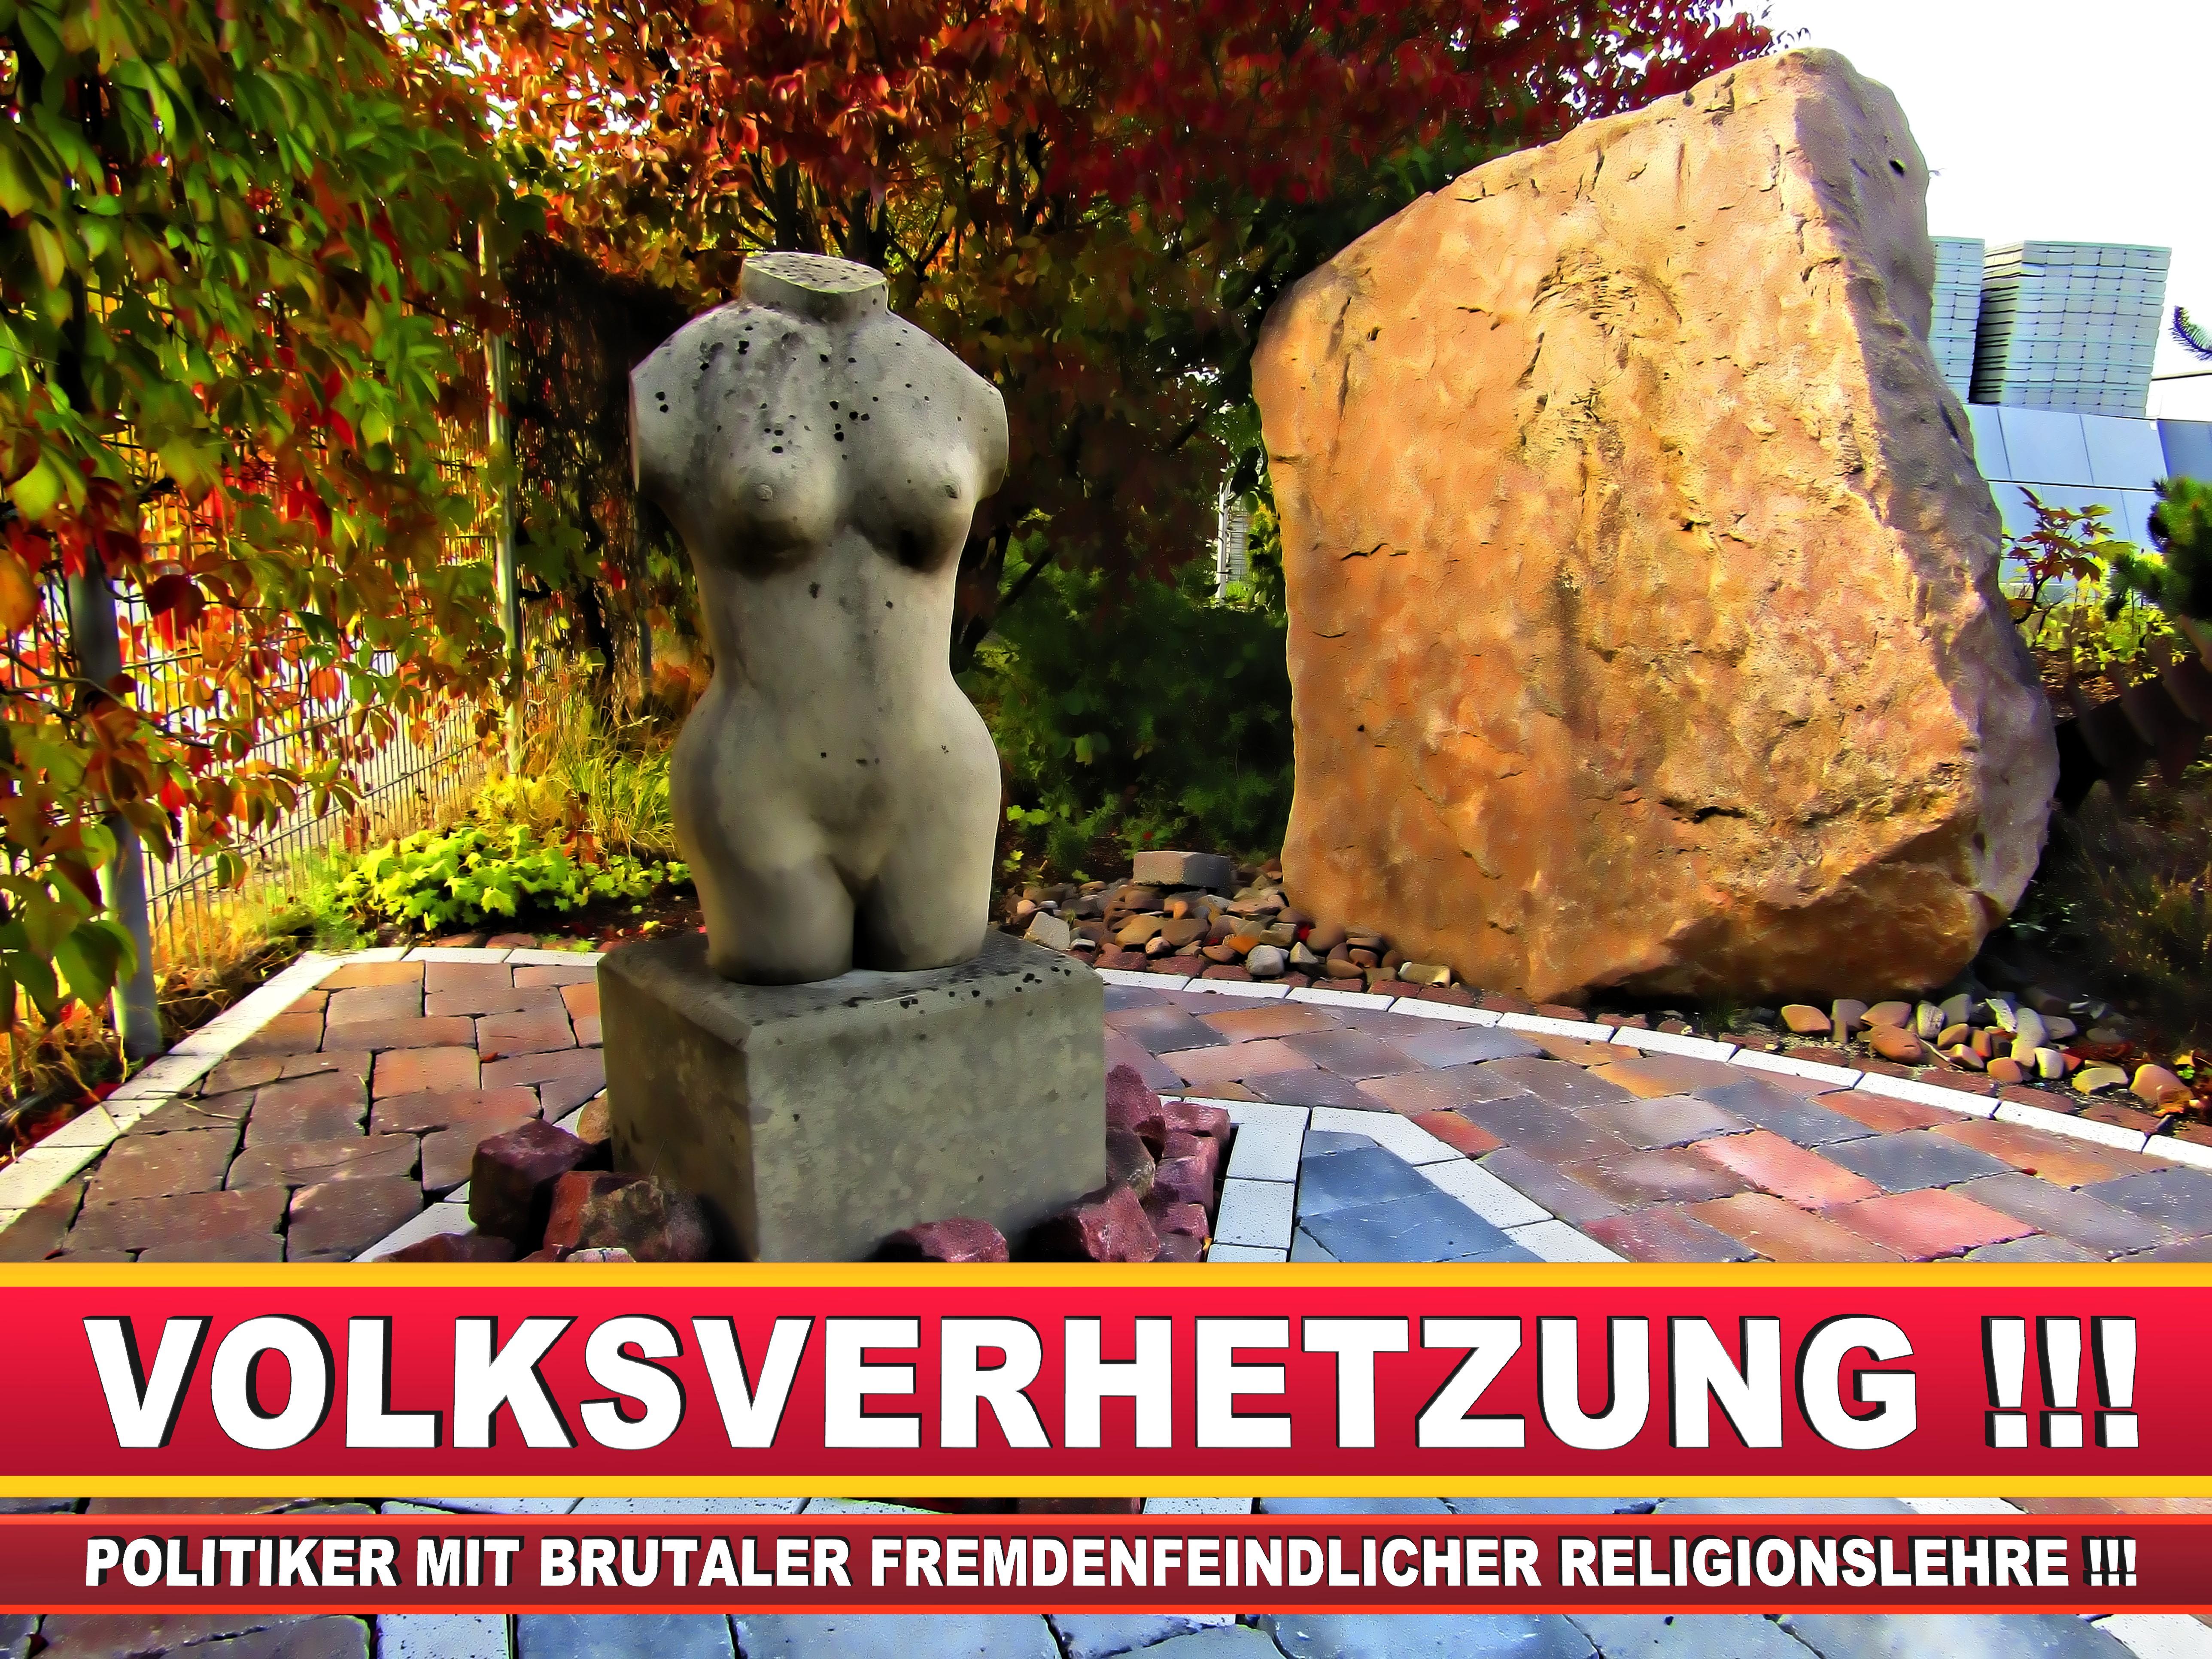 BETONWERK MÜNSTERMANN CDU GÜTERSLOH (2) LANDTAGSWAHL BUNDESTAGSWAHL BÜRGERMEISTERWAHL